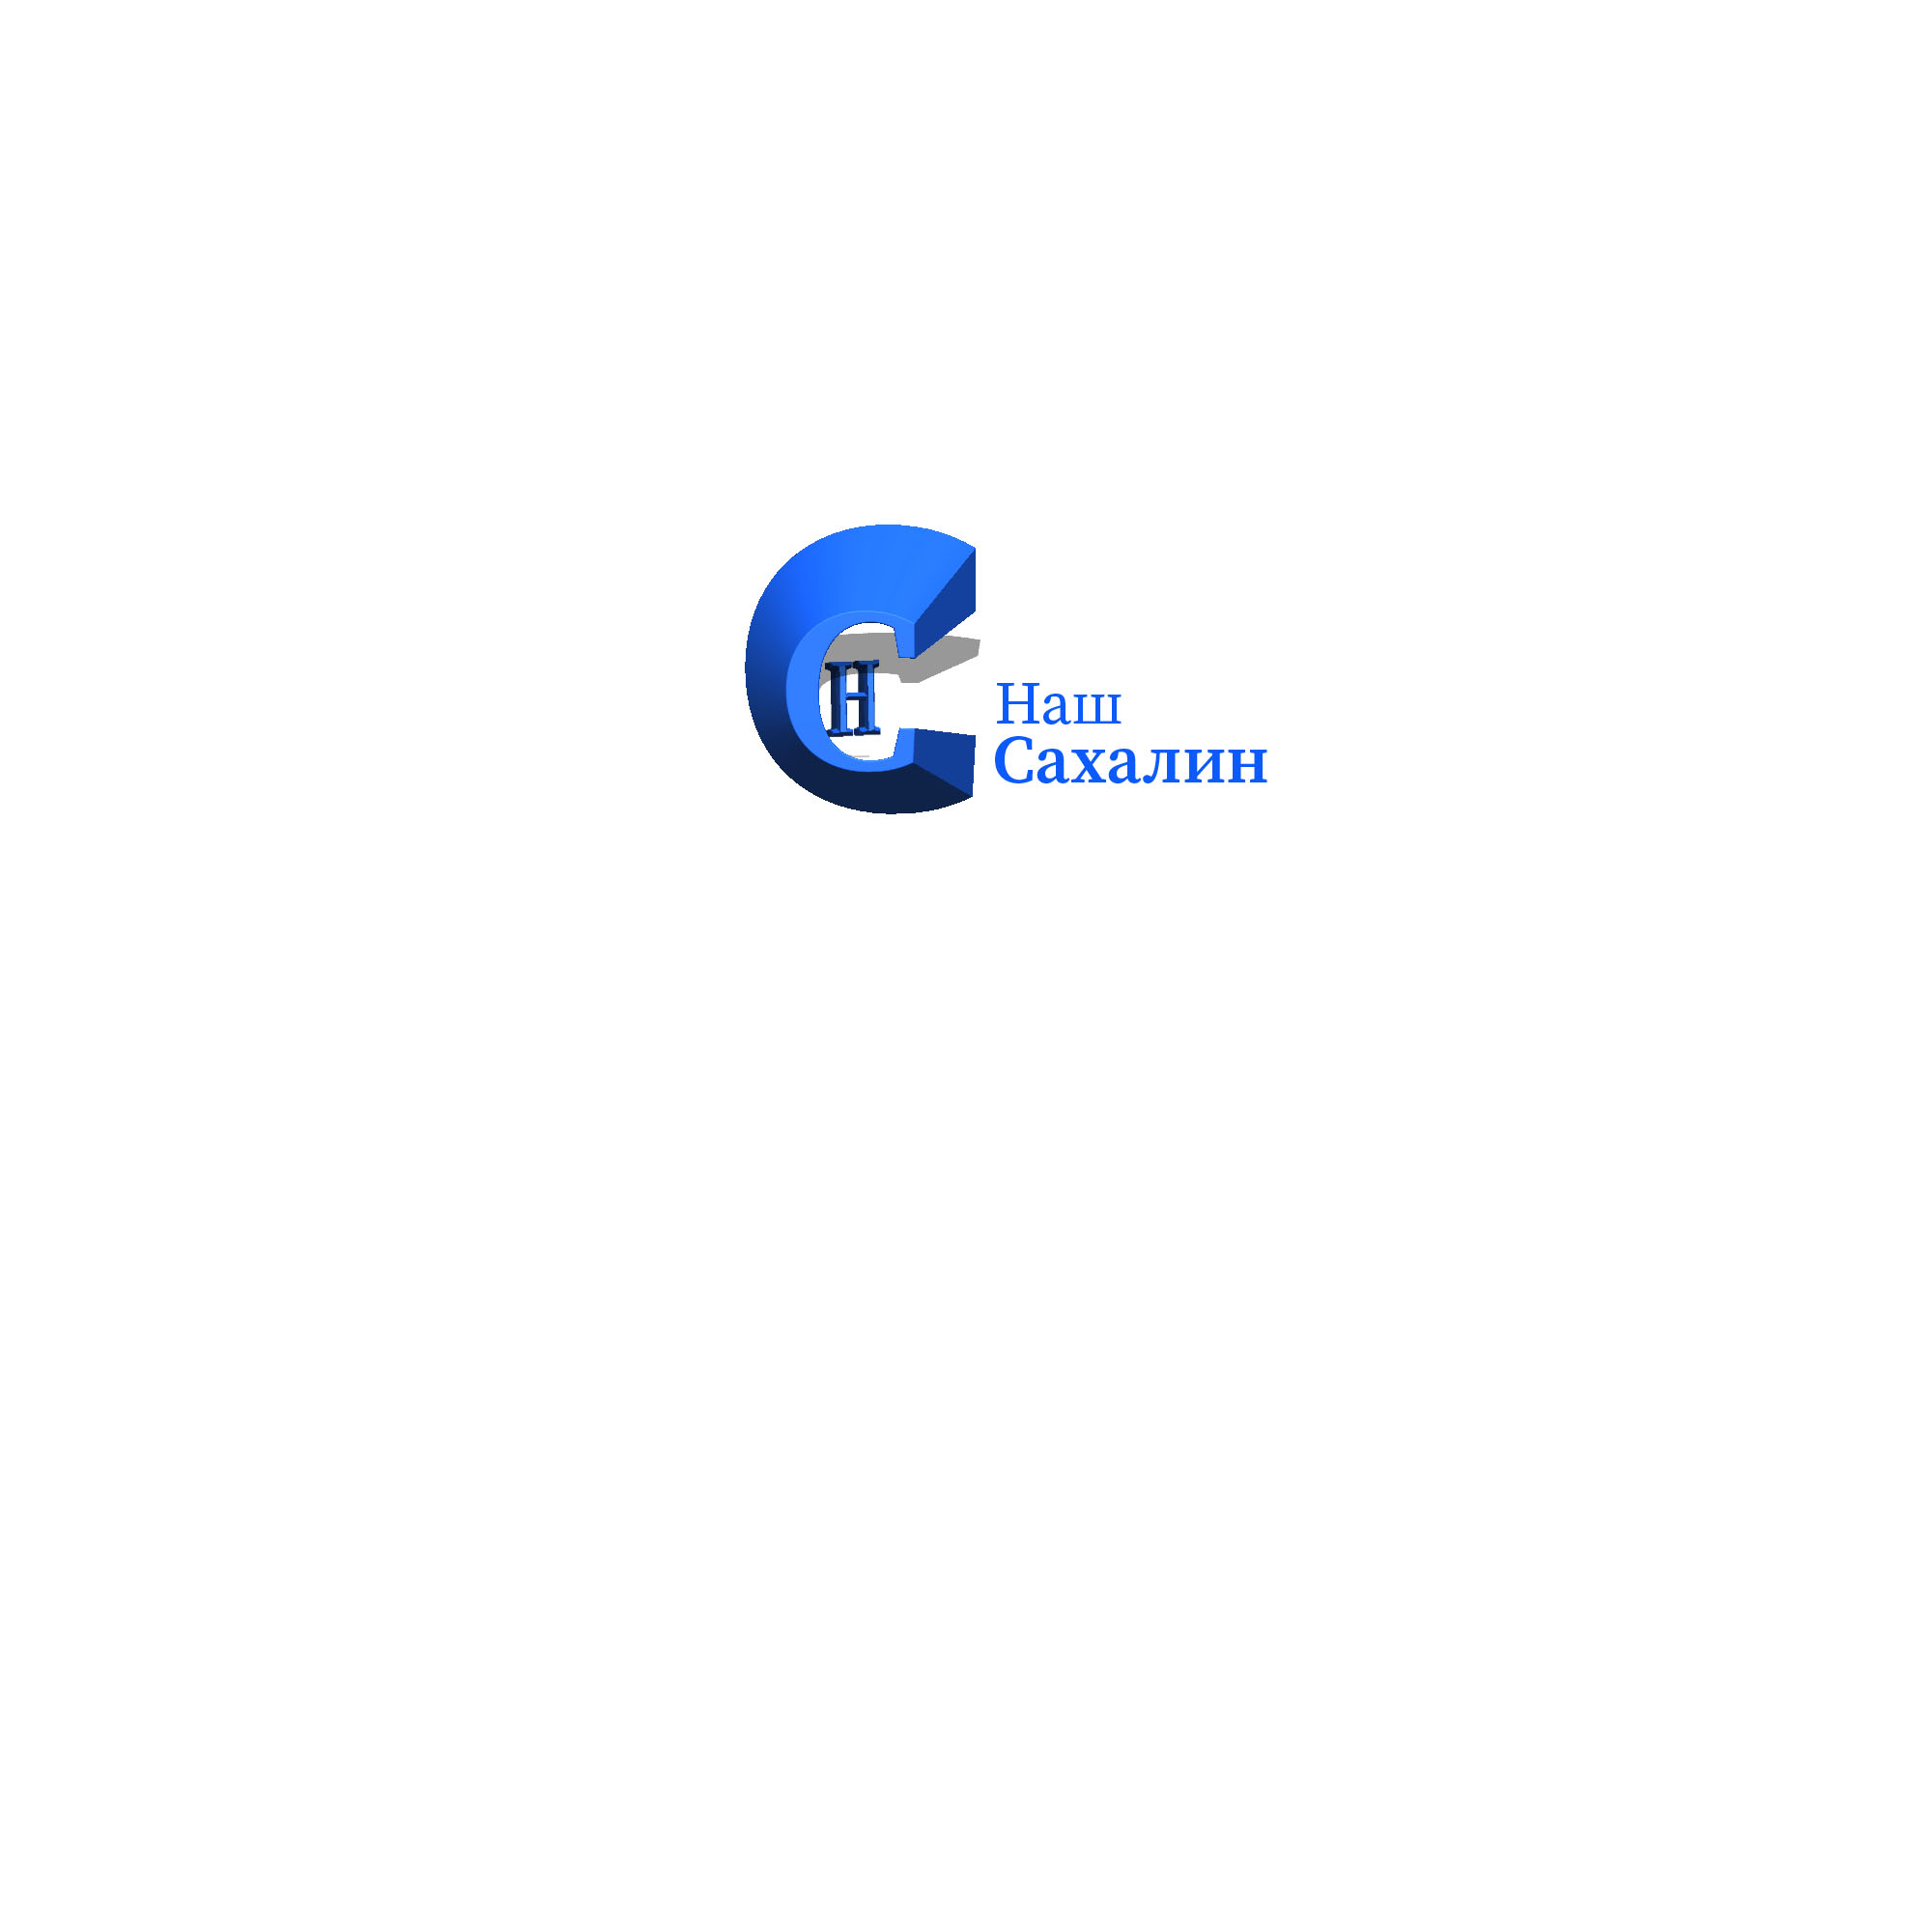 "Логотип для некоммерческой организации ""Наш Сахалин"" фото f_5185a7bf2ab0058e.jpg"